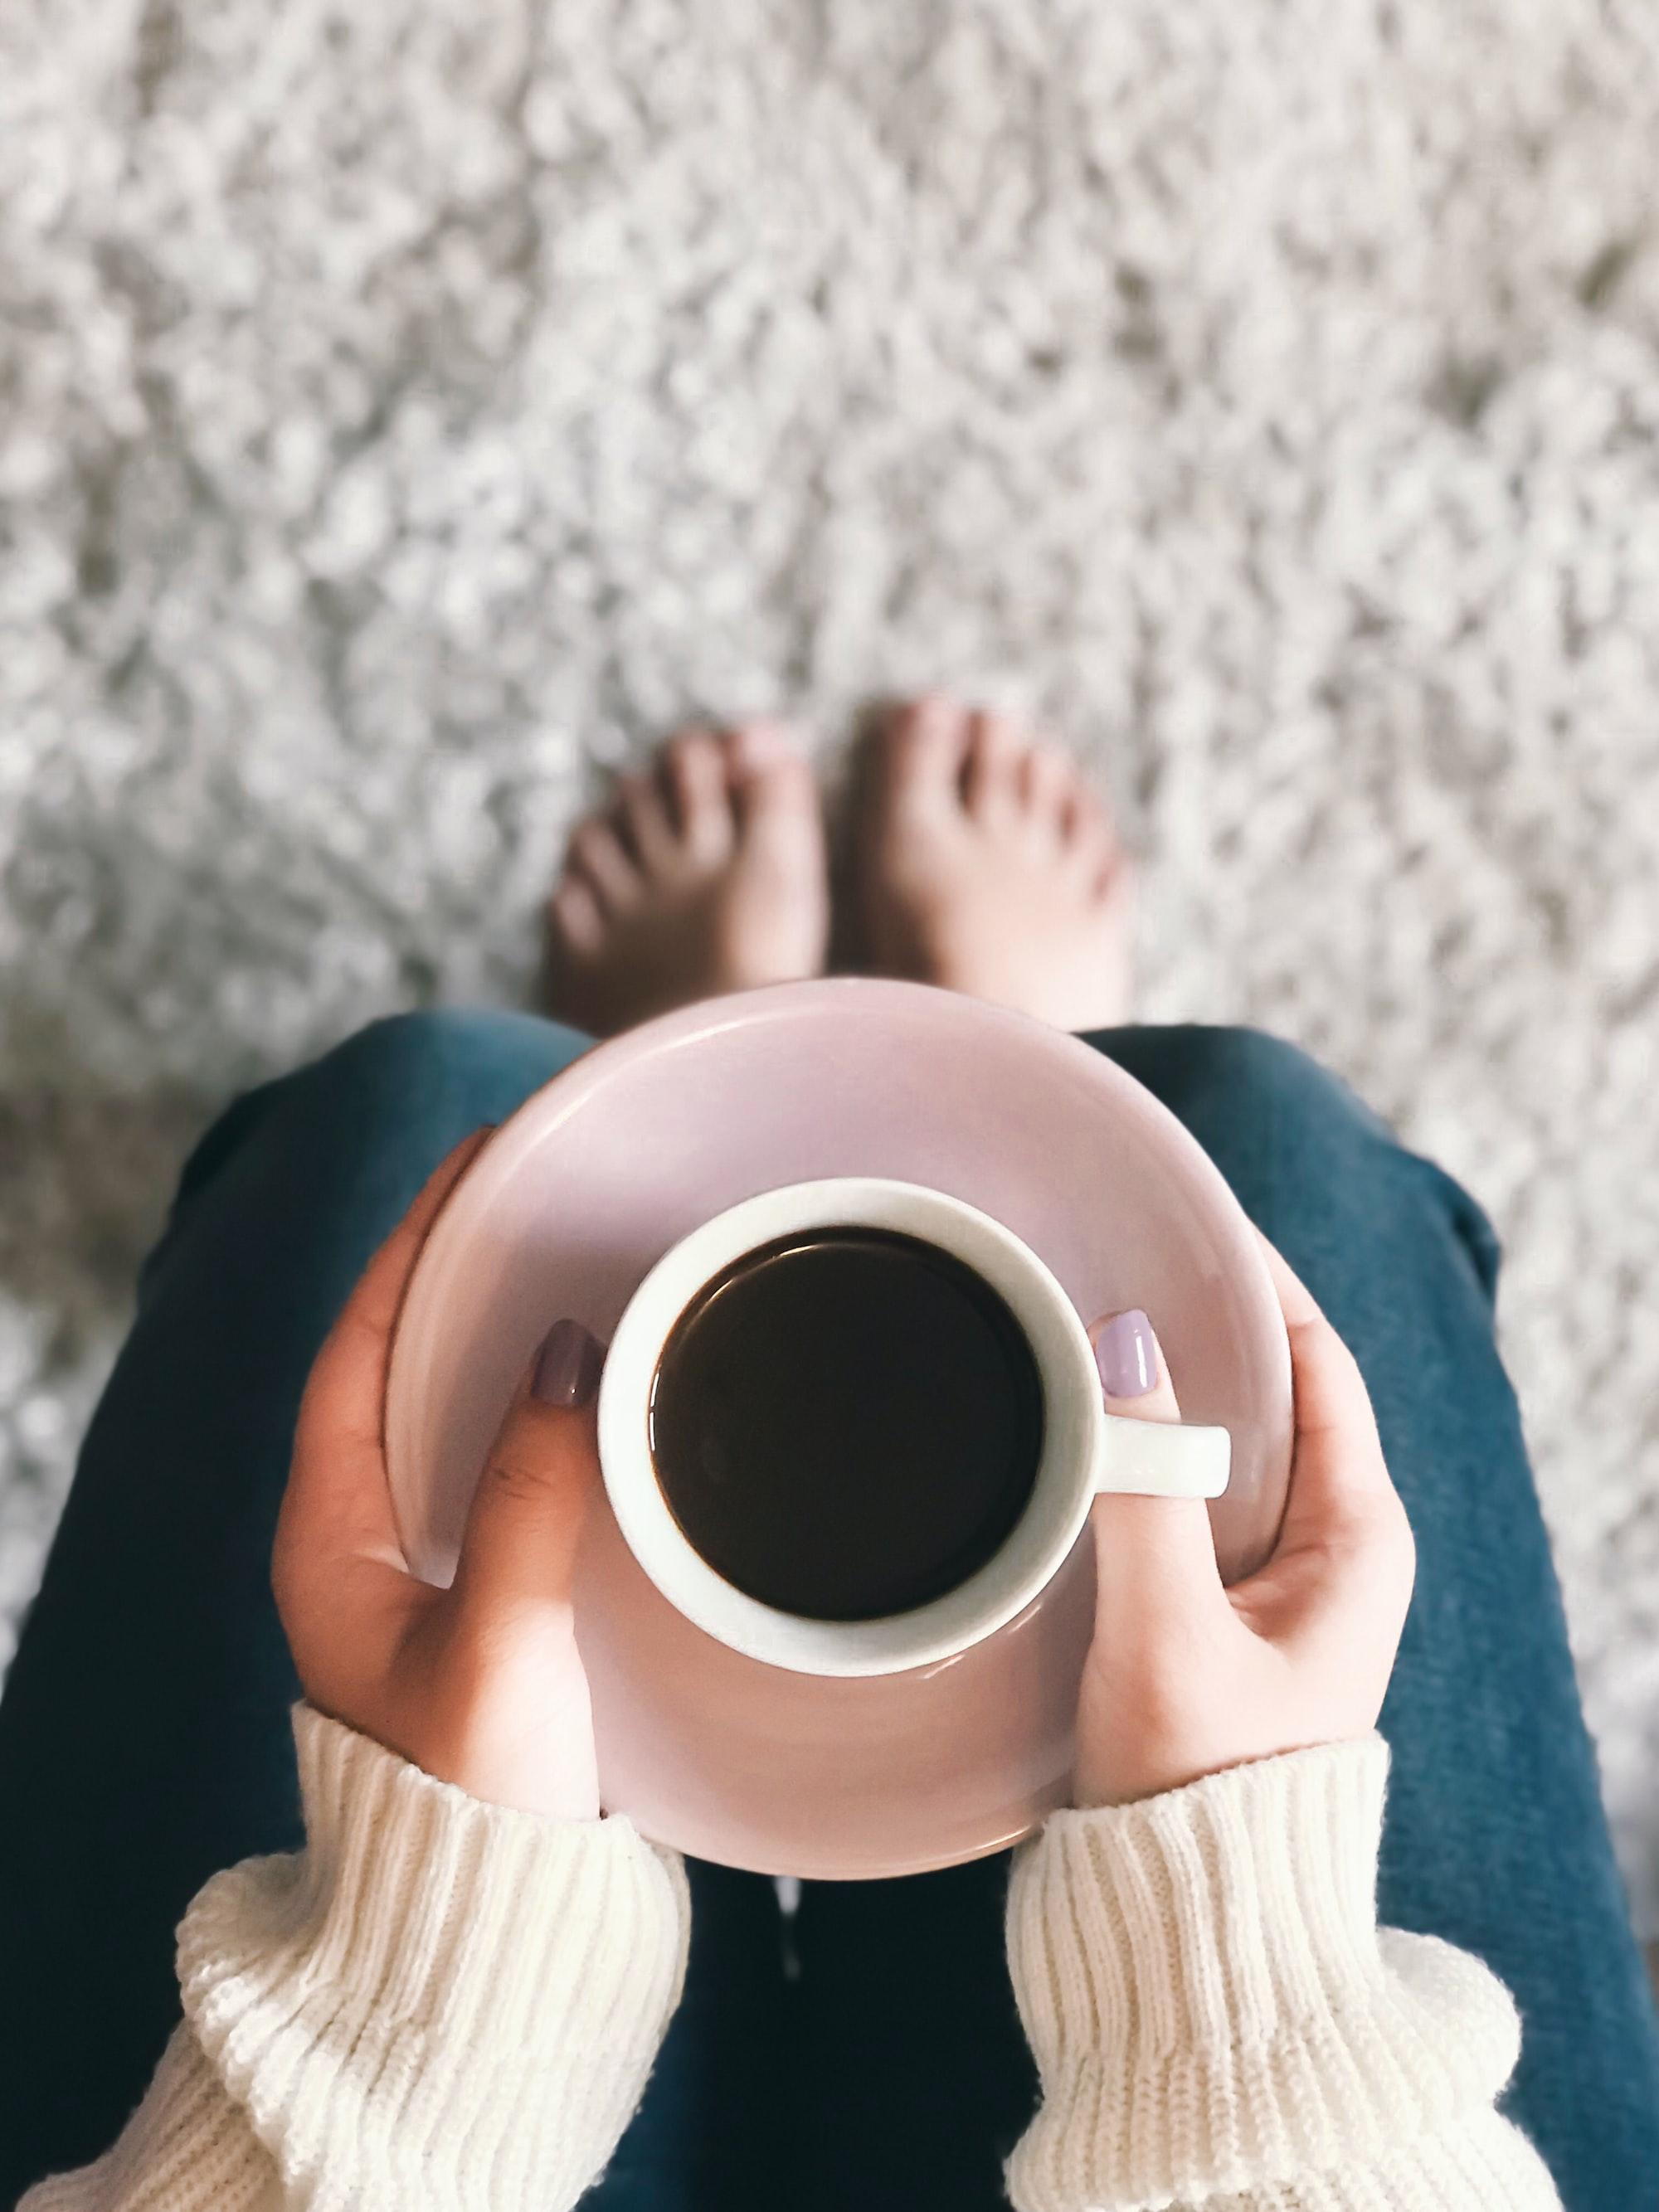 I quit caffeine for 30 days, again.